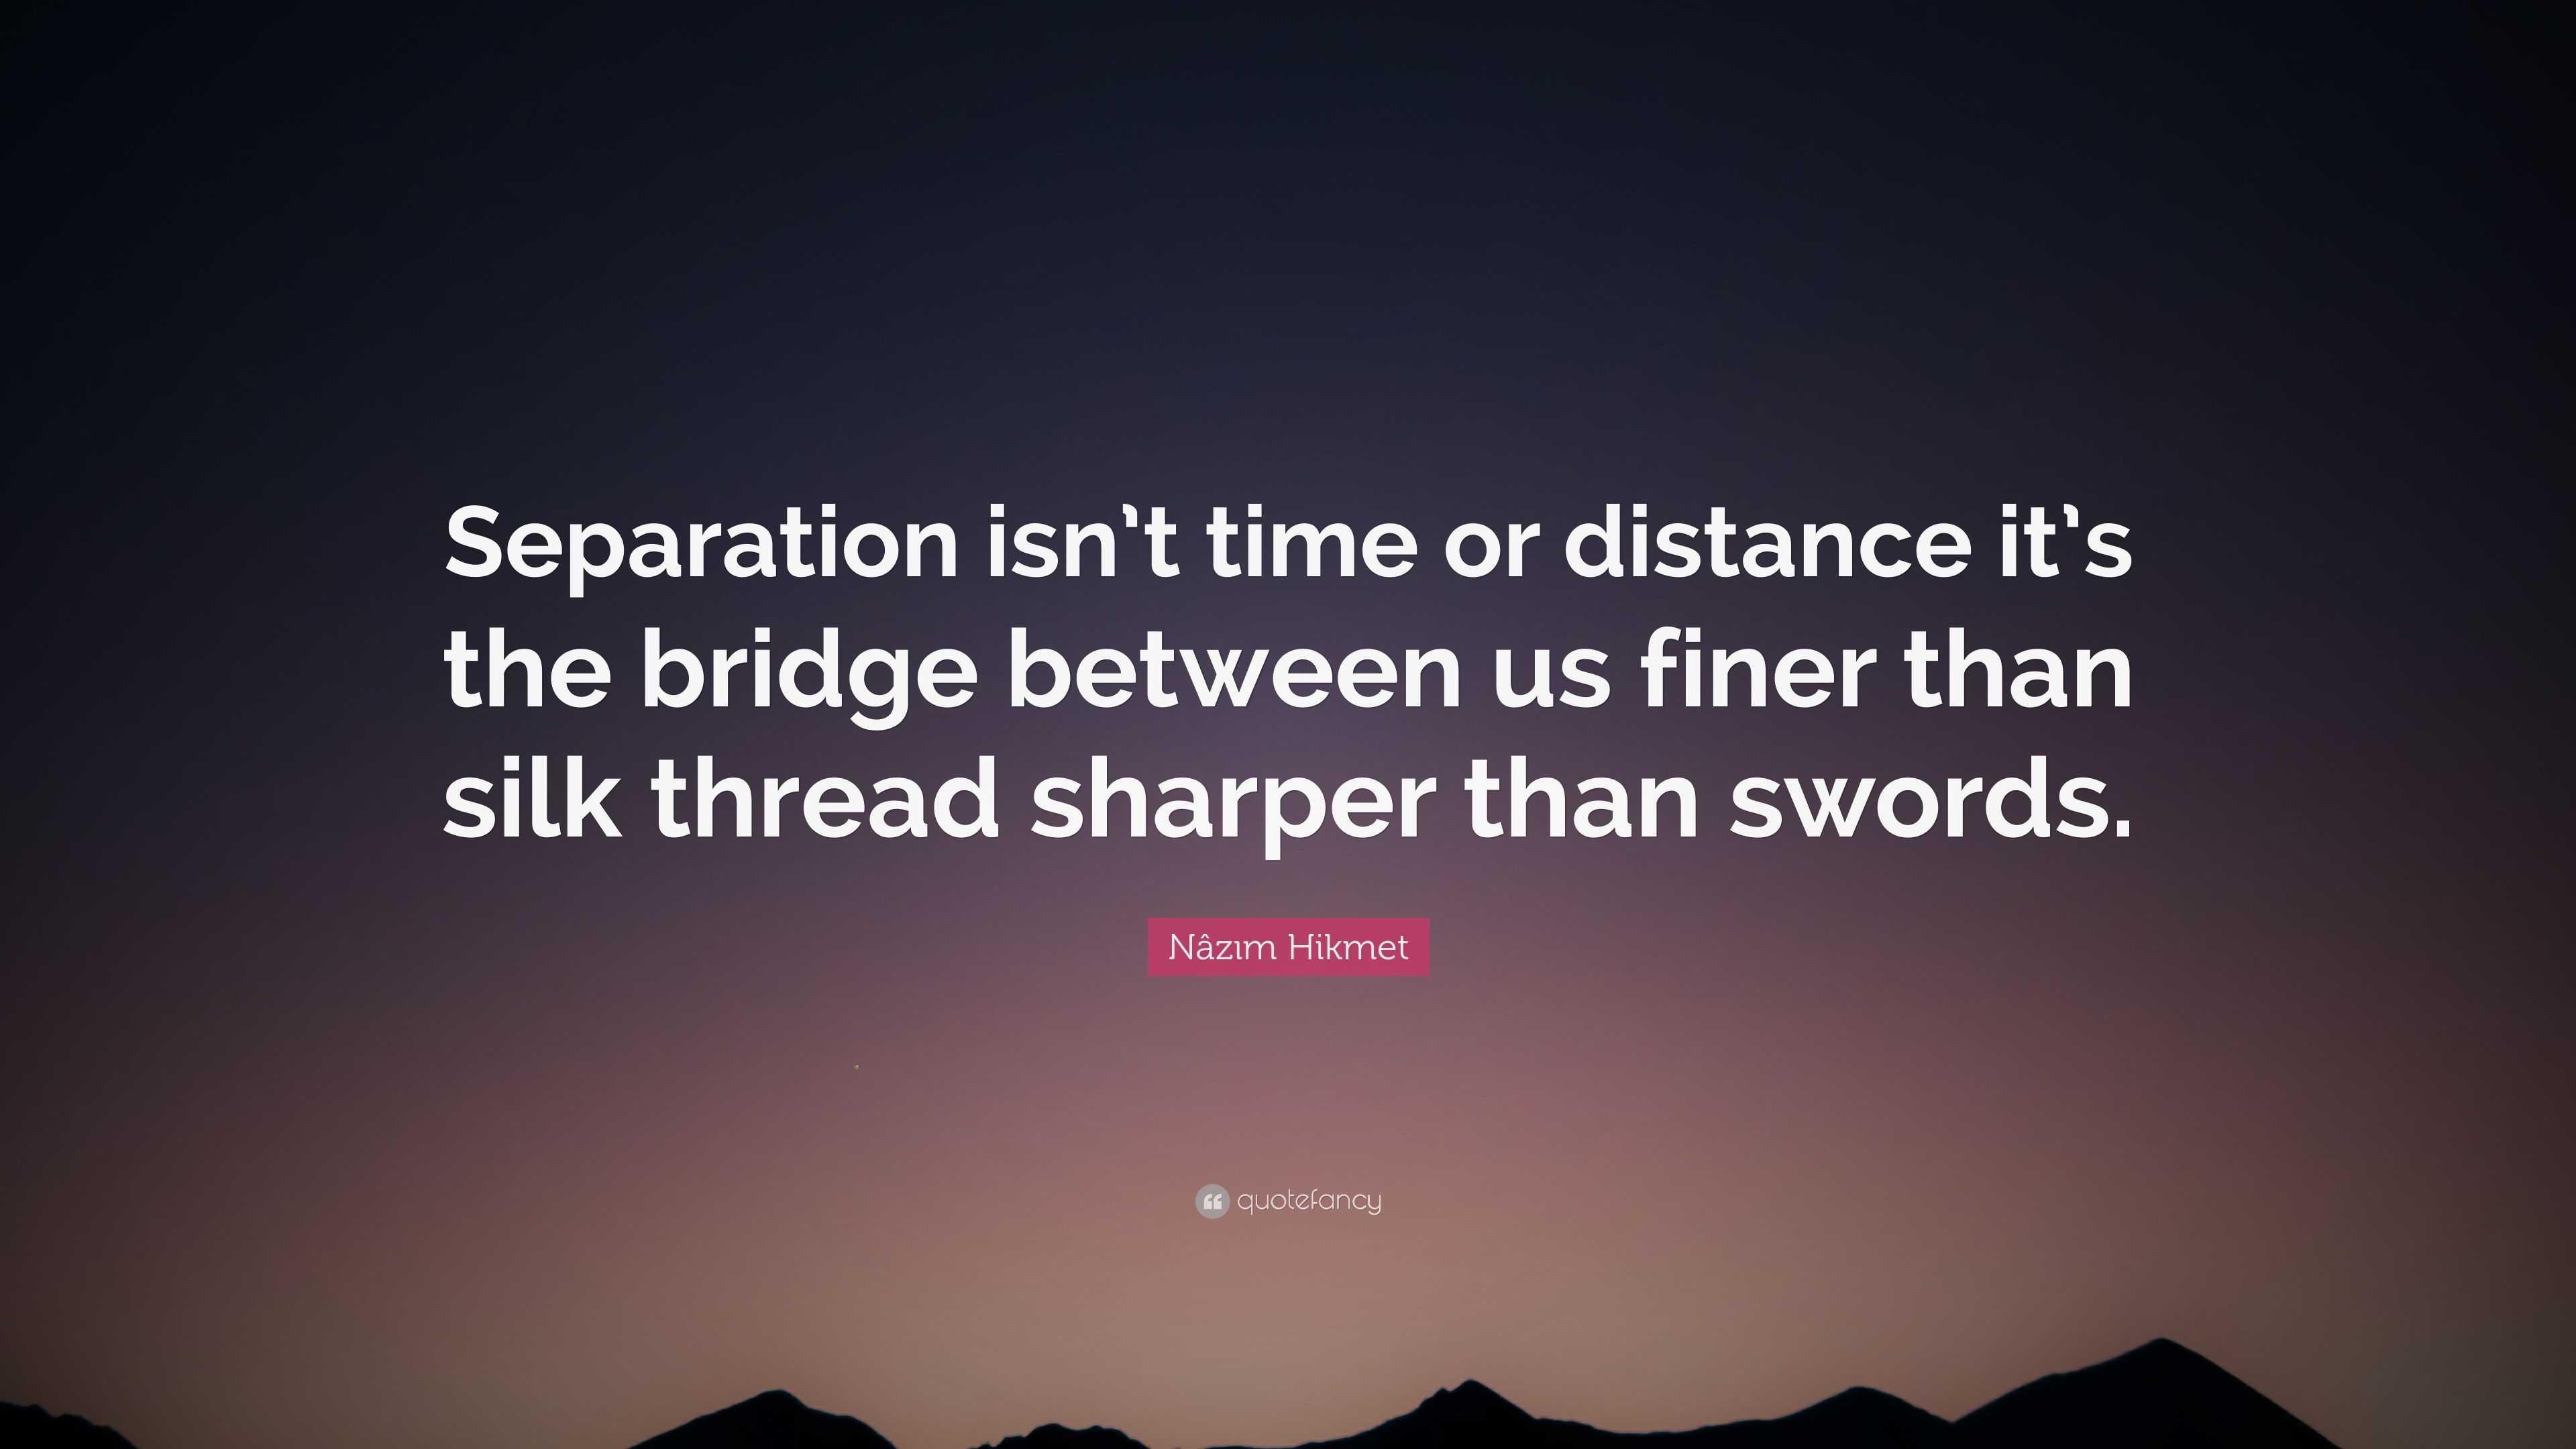 Nâzım Hikmet Quote Separation Isnt Time Or Distance Its The